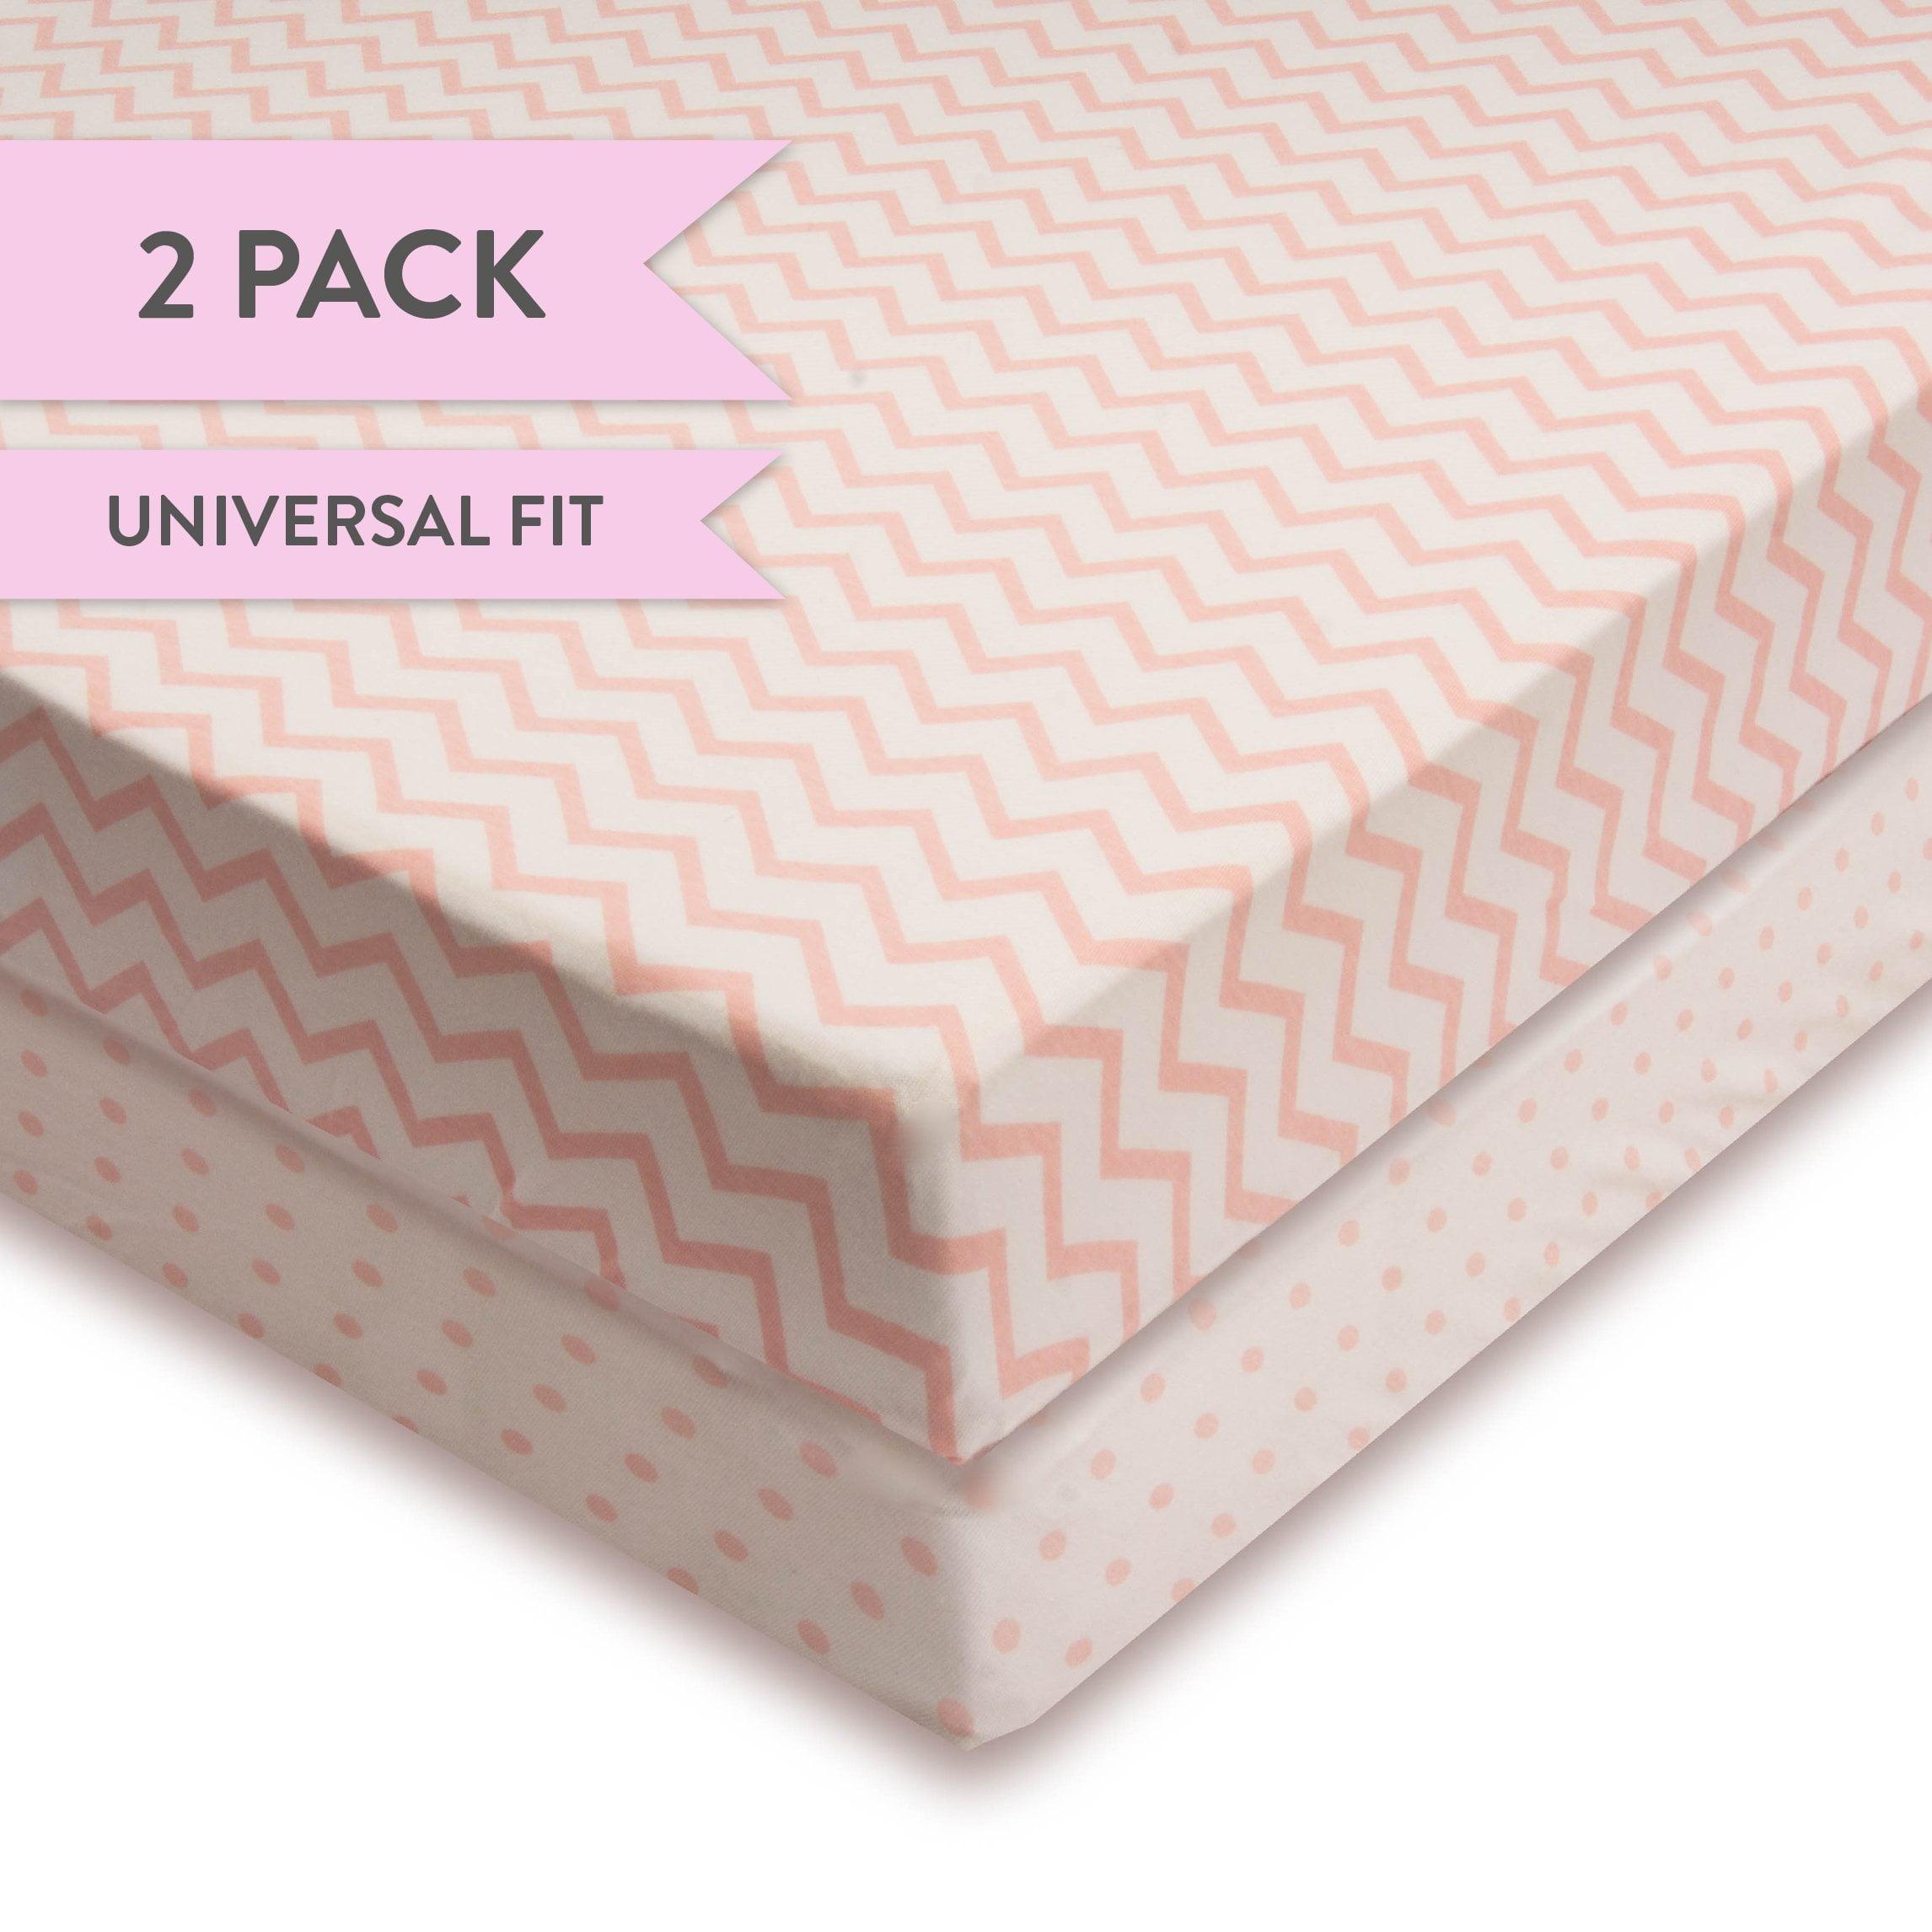 Crib Sheet Set 100% Jersey Cotton 2 Pack - Pink Chevron and Polka Dots Copy